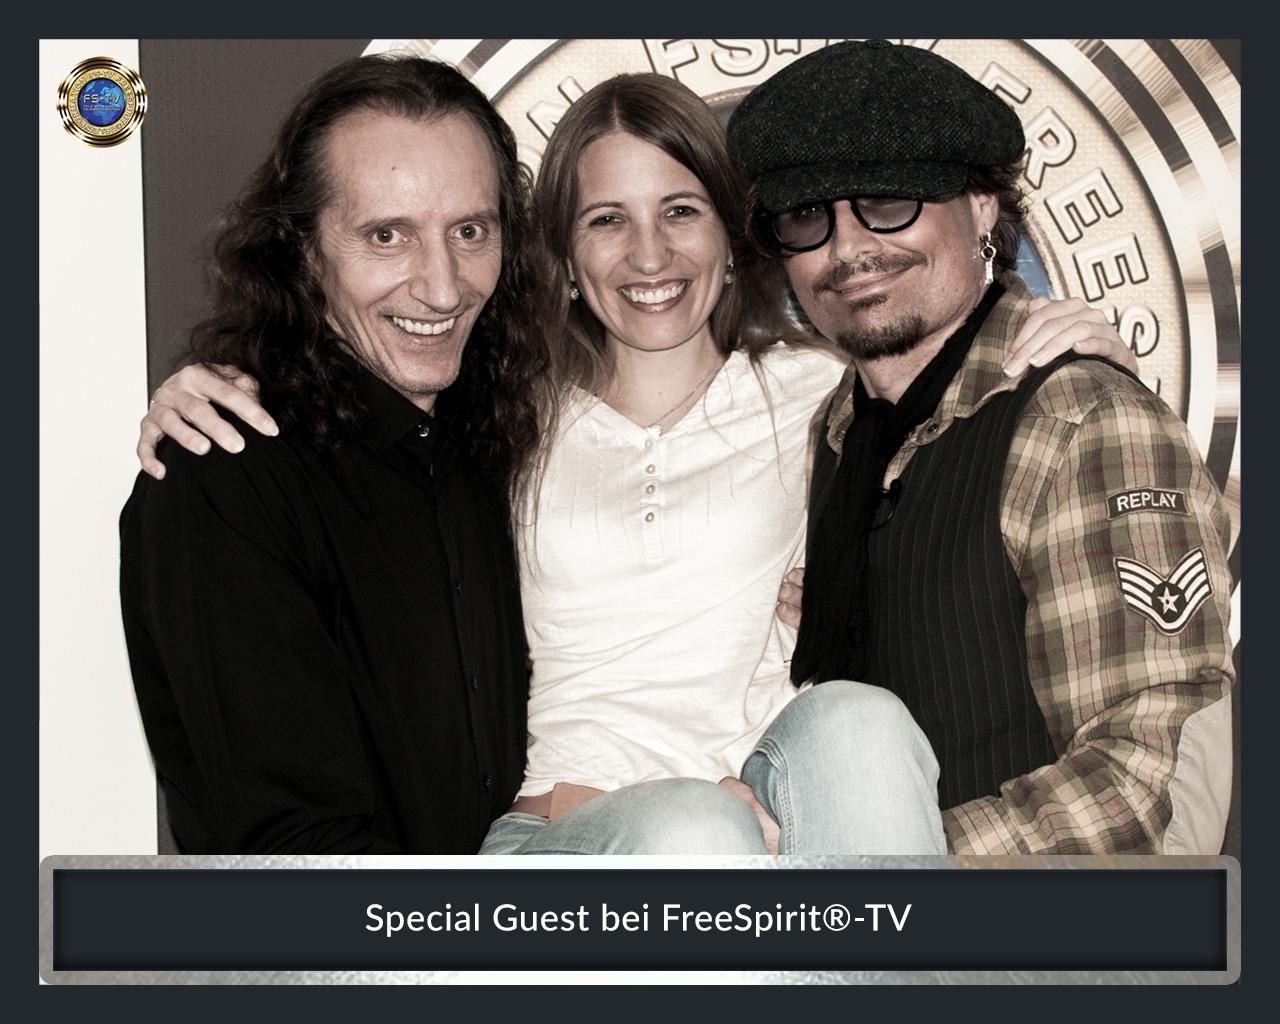 FS-TV-Bildergallerie-Special-Guest-1